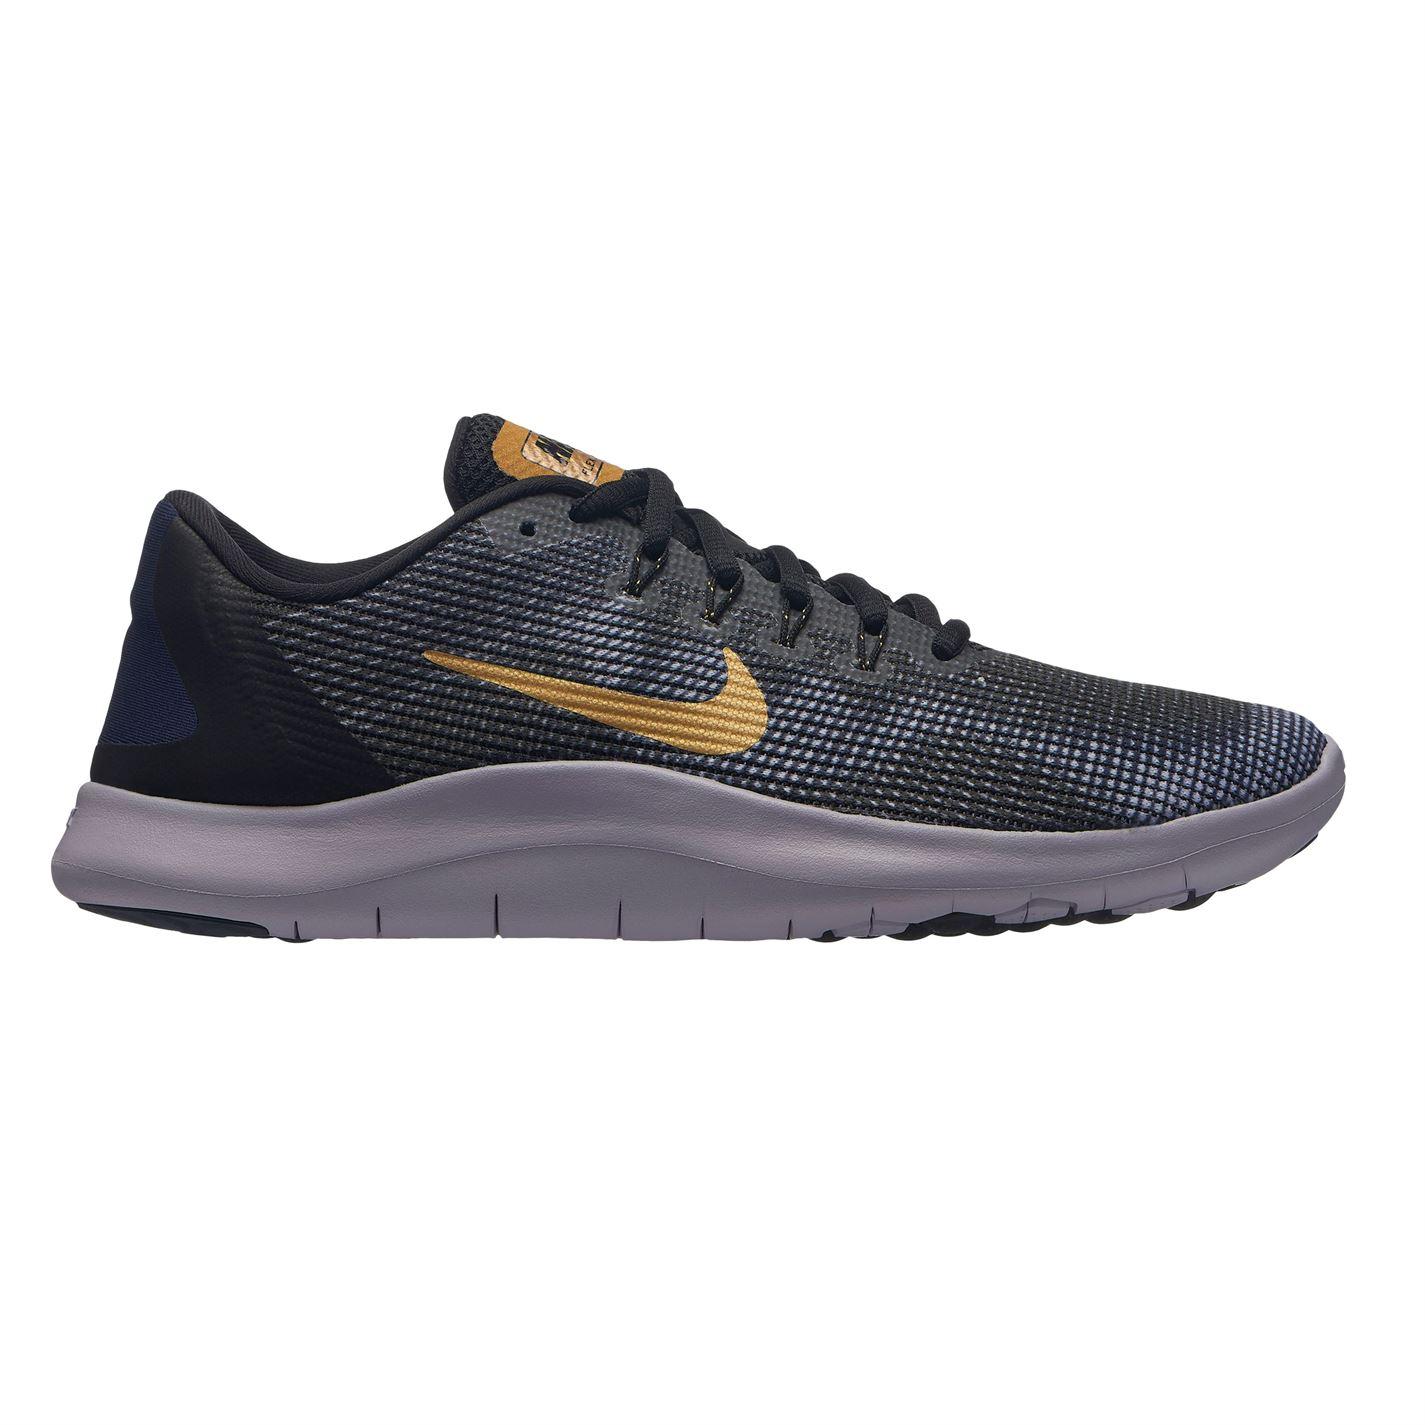 f65f4fc4e41b7 Nike Flex 2018 Run dámska bežecká obuv Black/Gold - Glami.sk